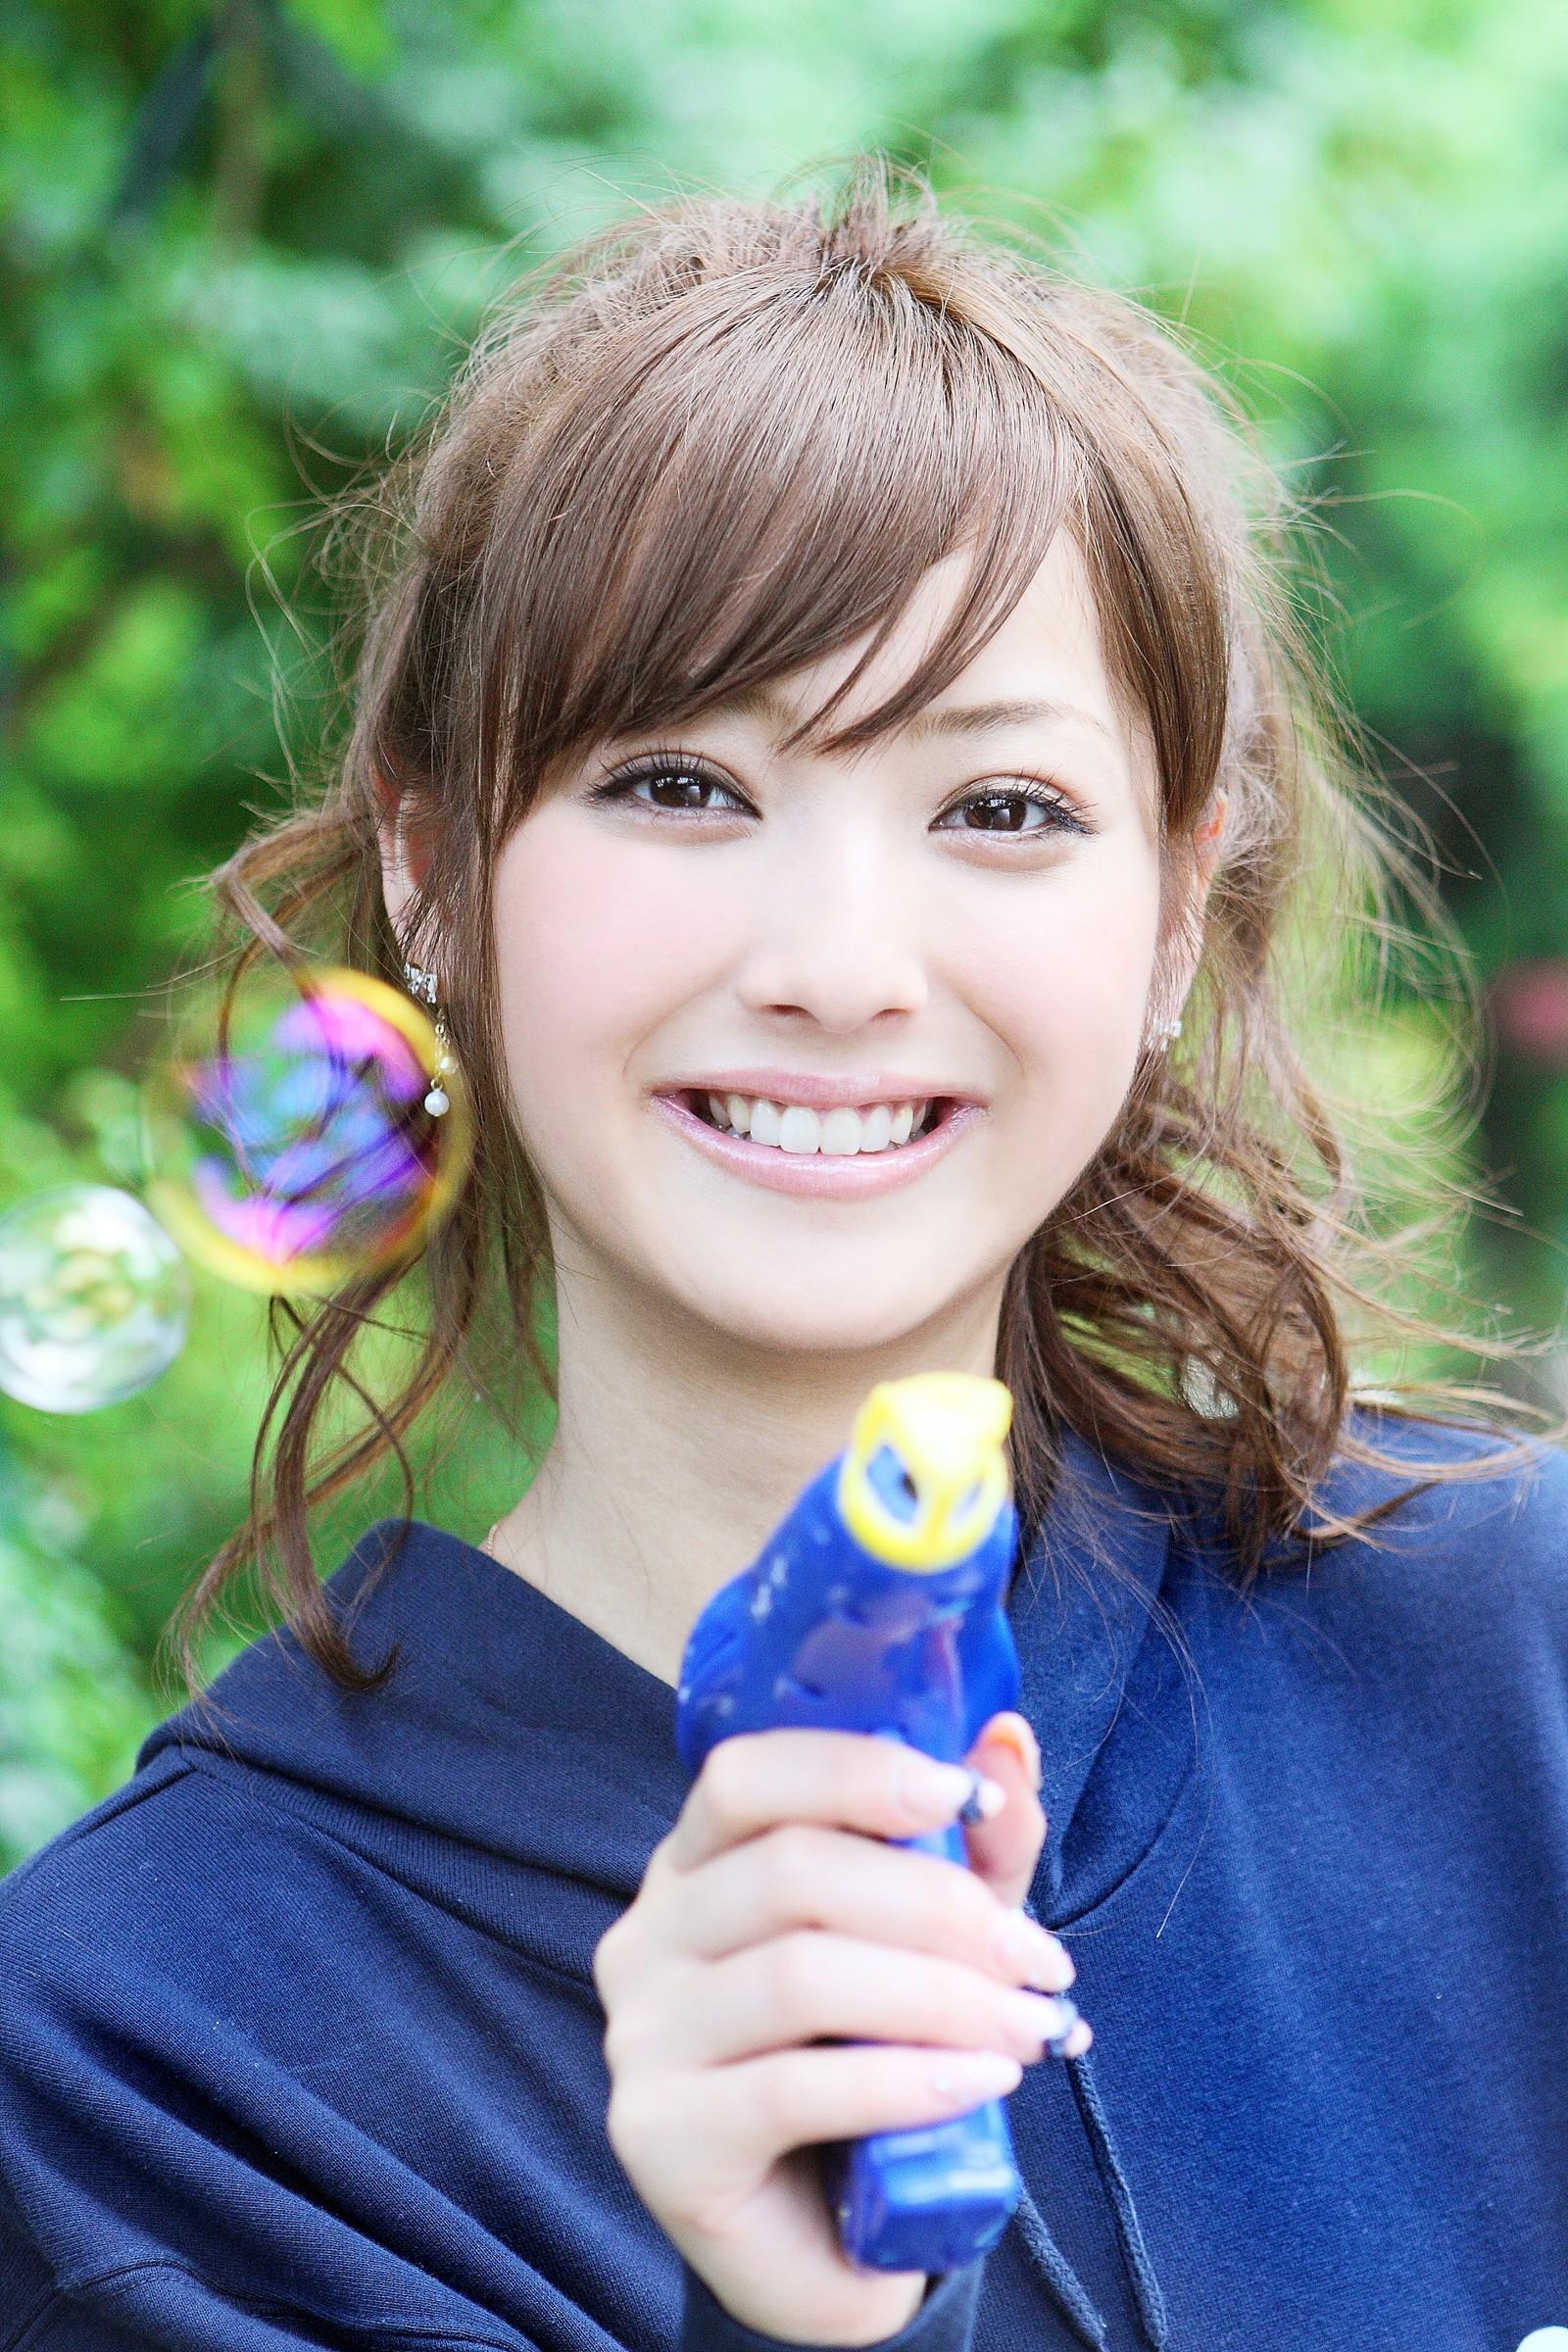 People 1600x2400 Sasaki Nozomi model Asian women Japanese bubbles smiling brunette brown eyes portrait